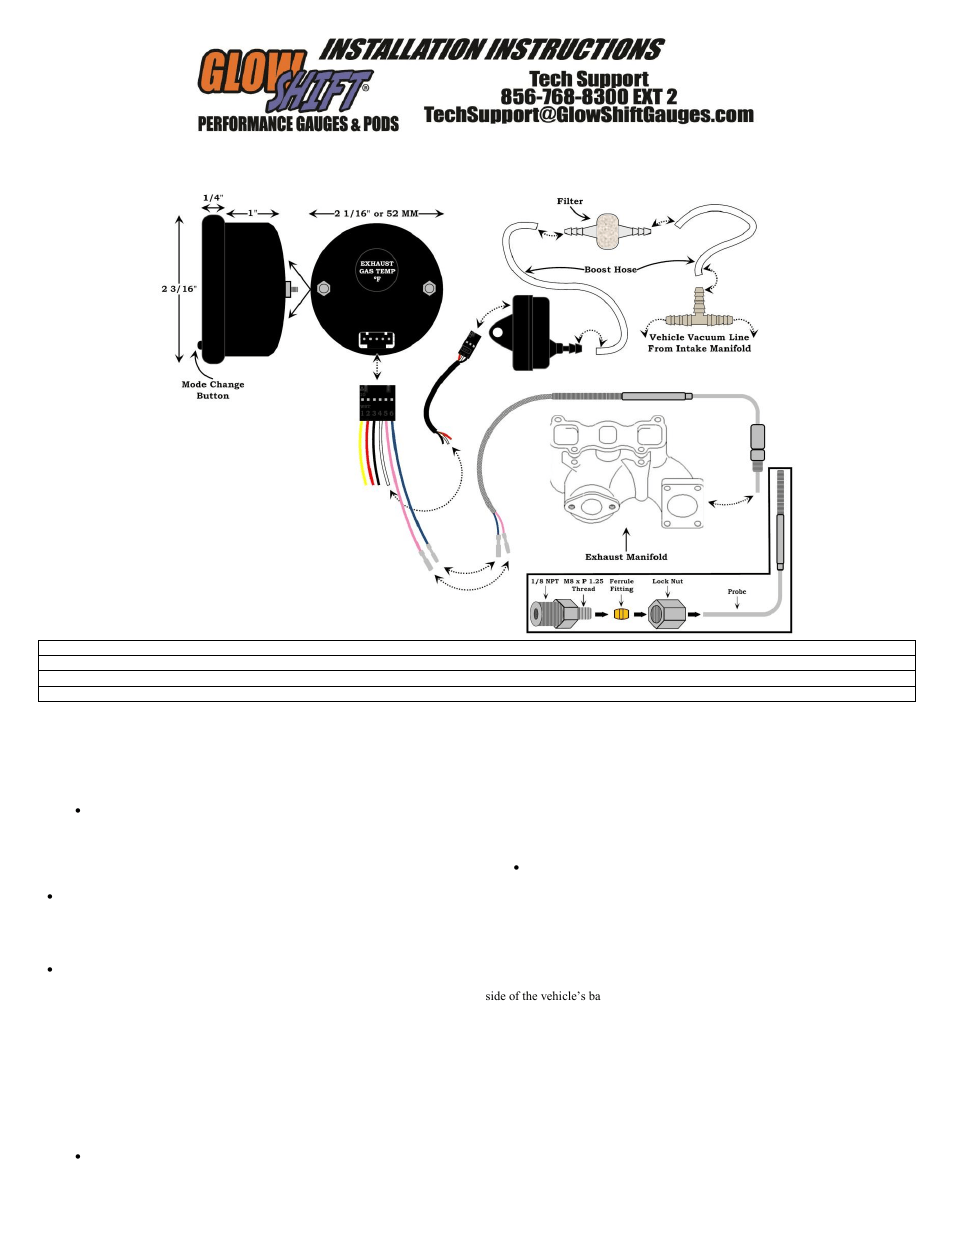 glowshift gauges wiring diagram pmebtbw eastsideit